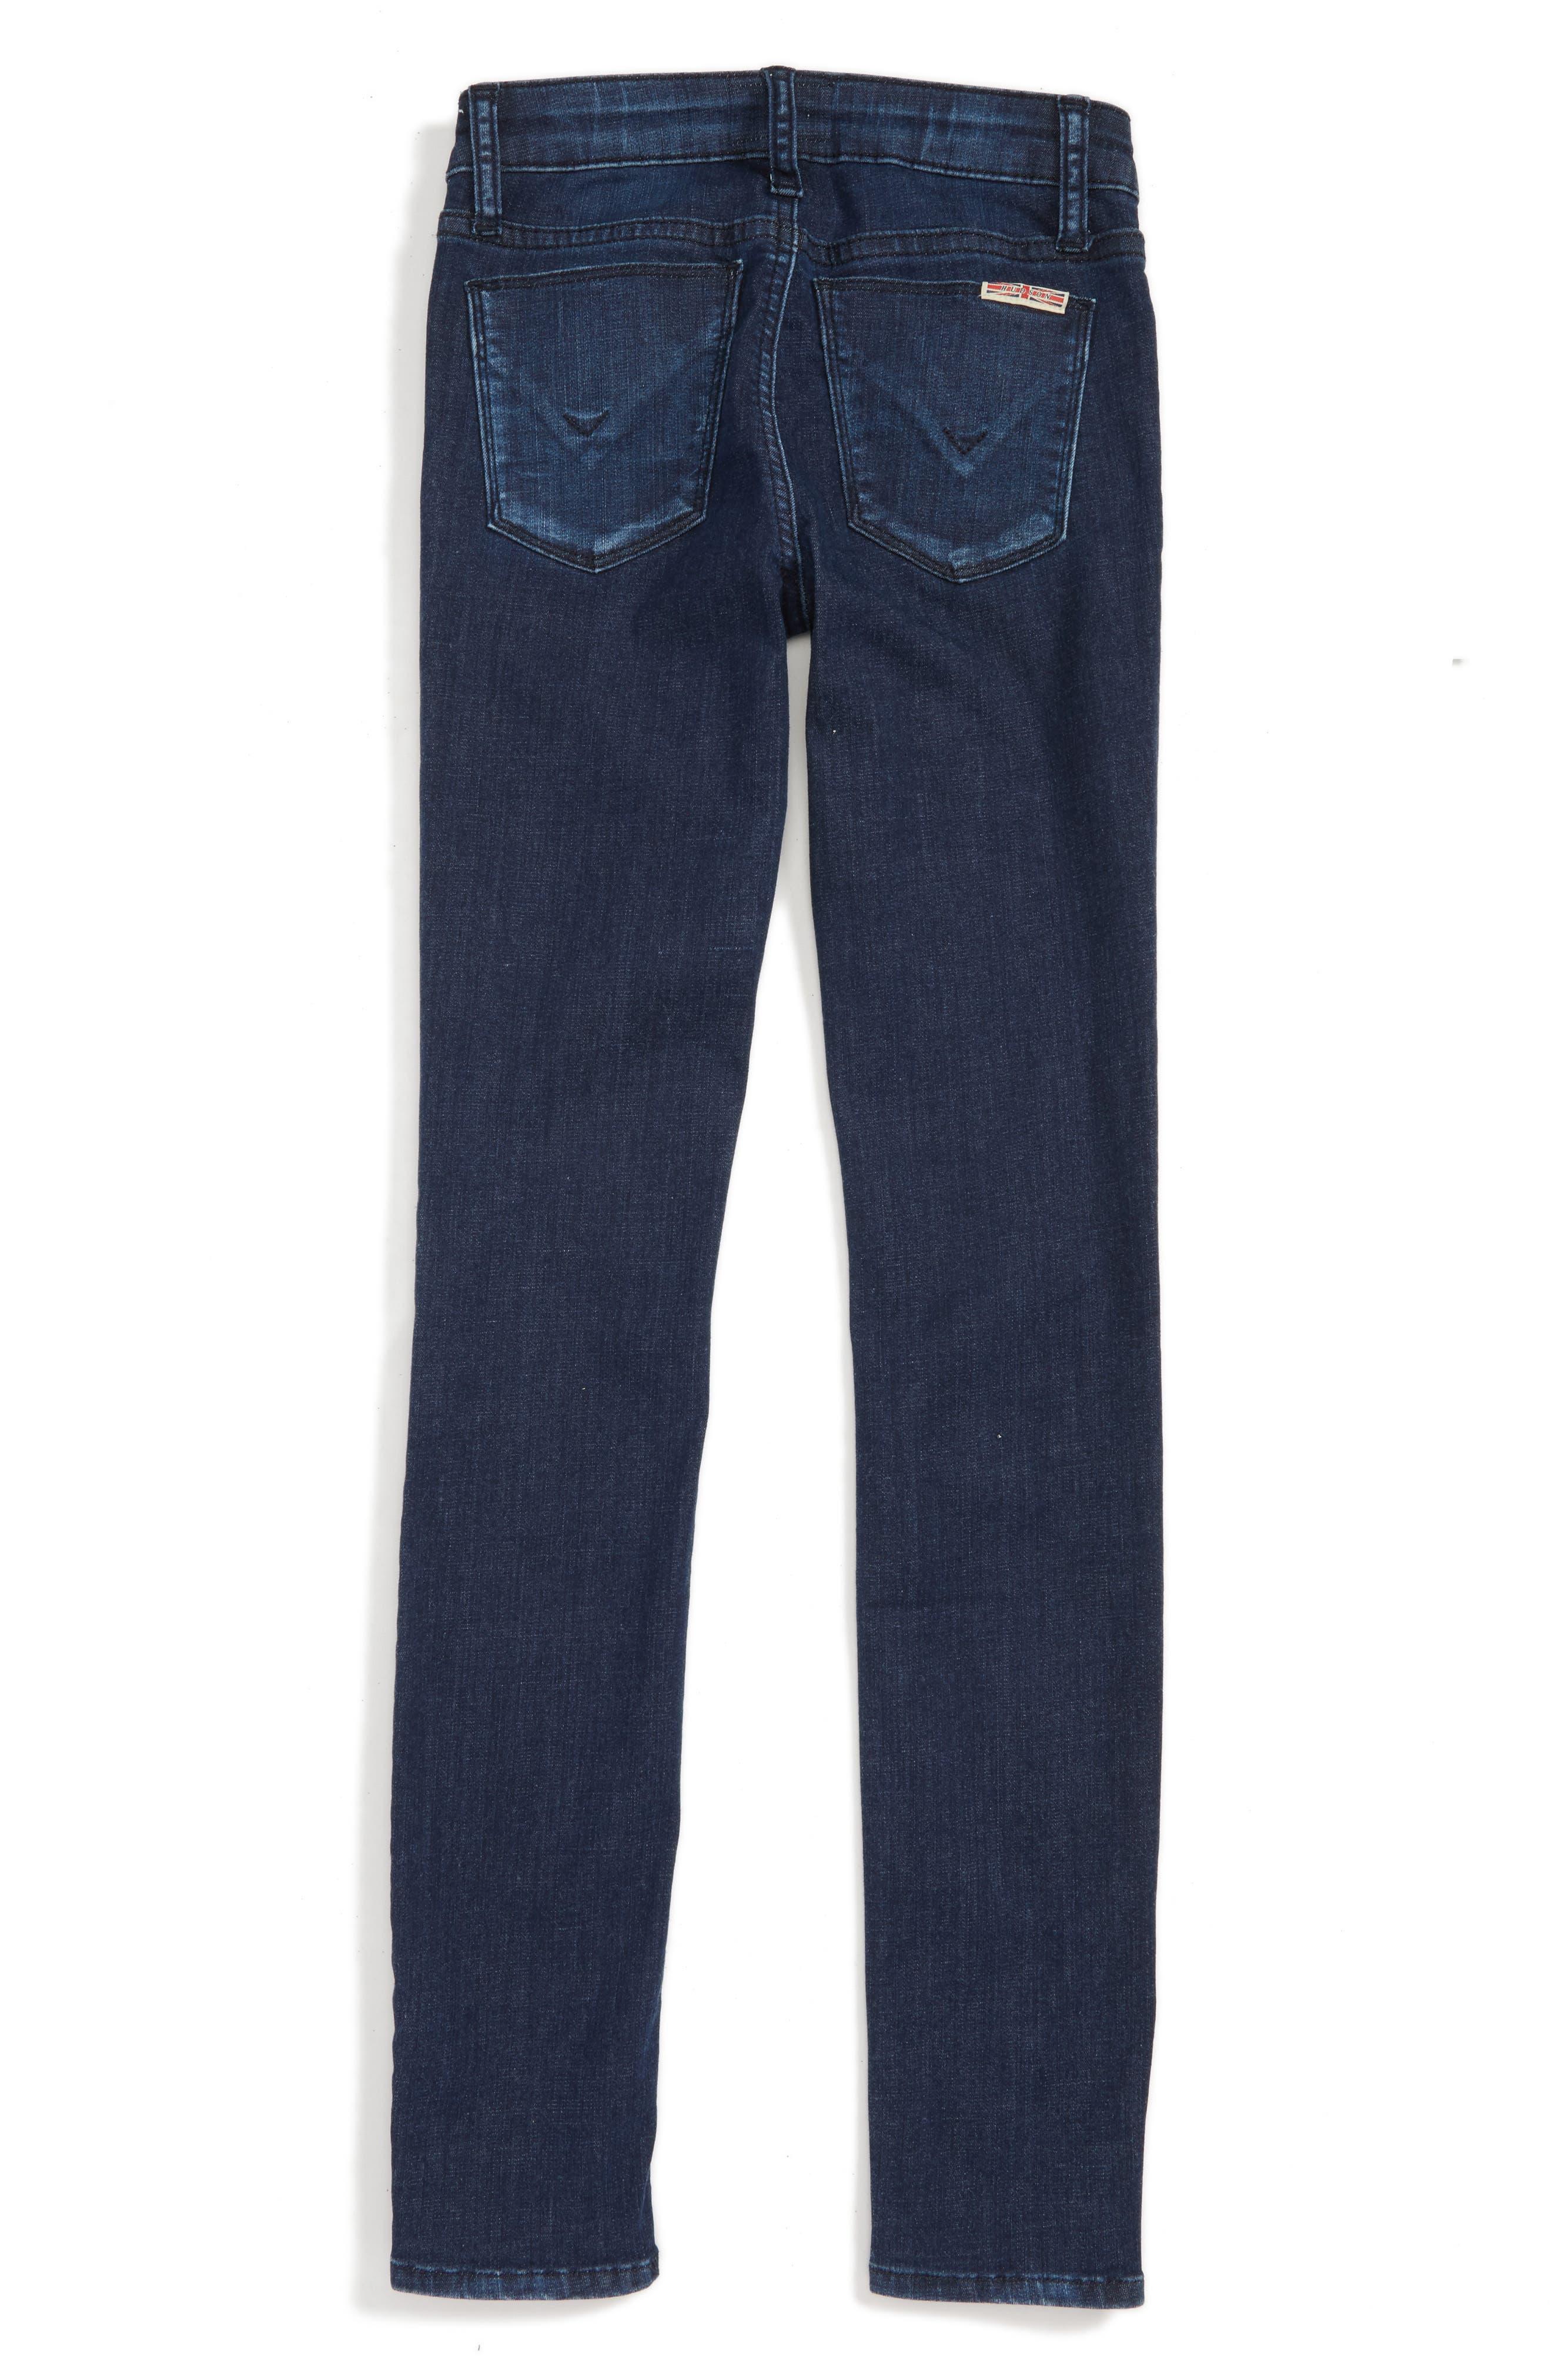 Alternate Image 3  - Hudson Kids Dolly Skinny Jeans (Big Girls)